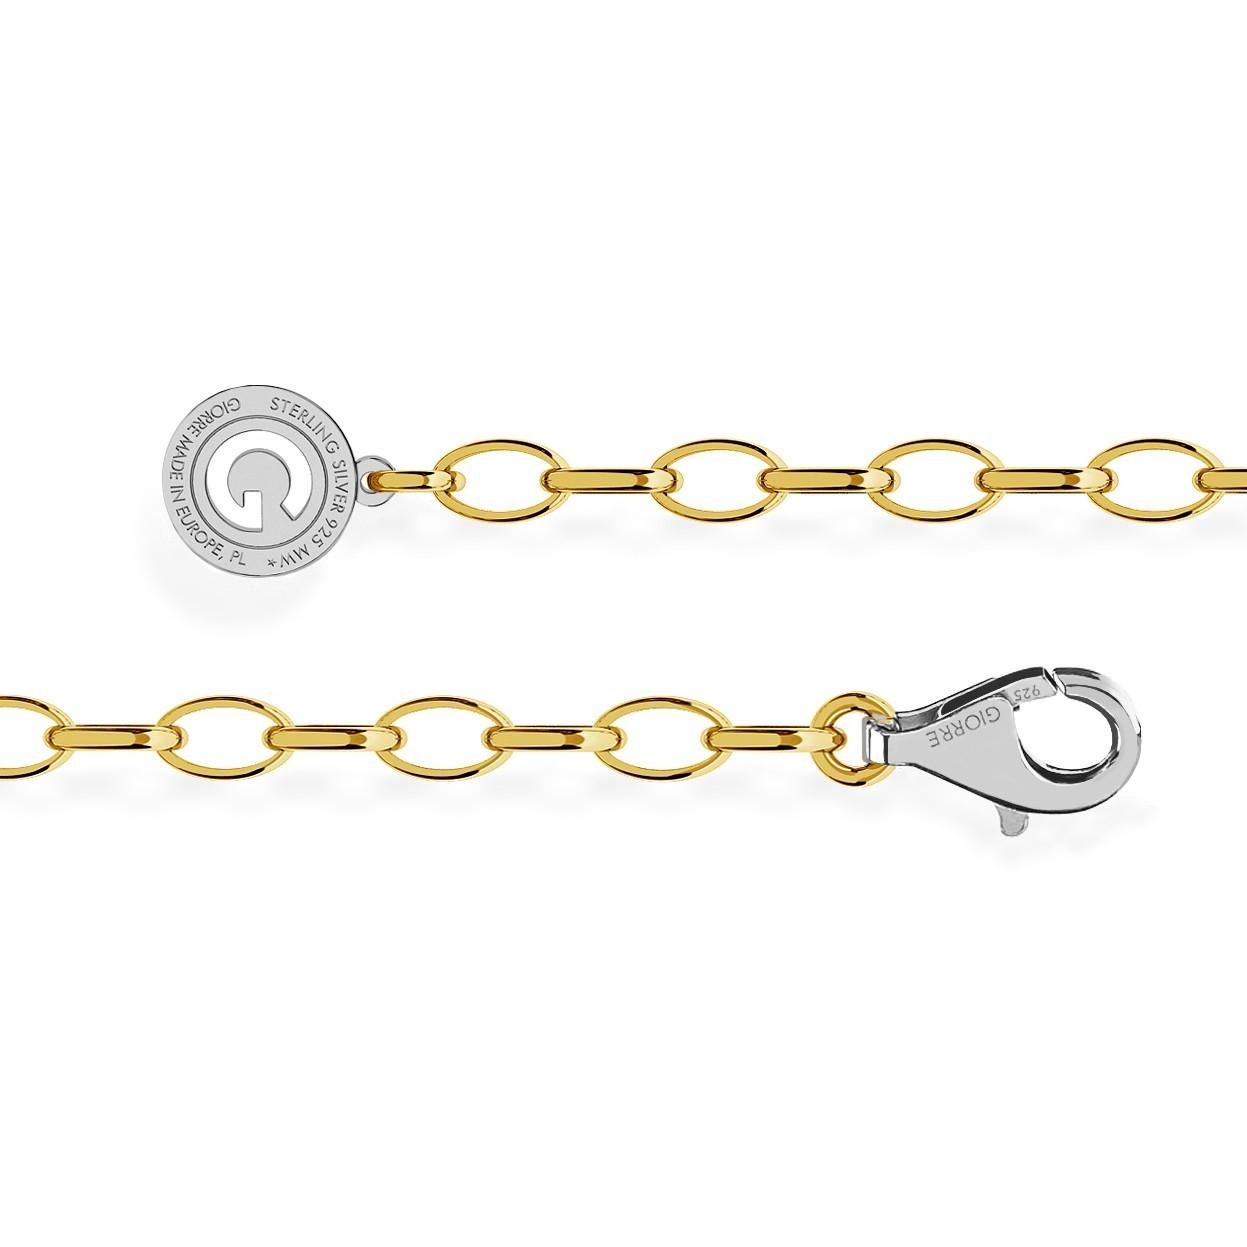 STERLING SILVER BRACELET 16-24 CM YELLOW GOLD, LIGHT RHODIUM CLASP, LINK 6X4 MM